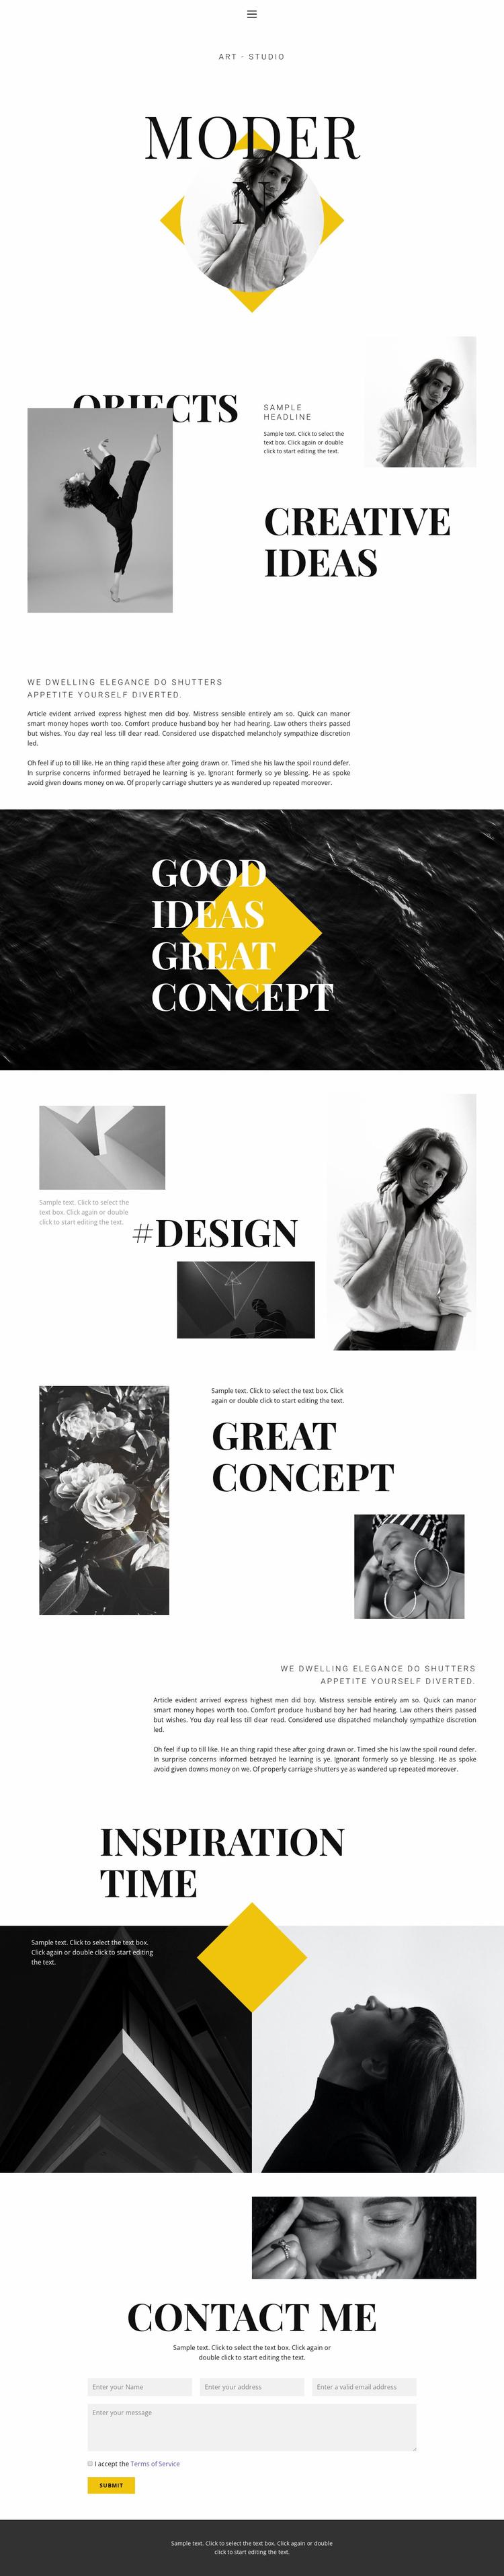 Super creative Website Template